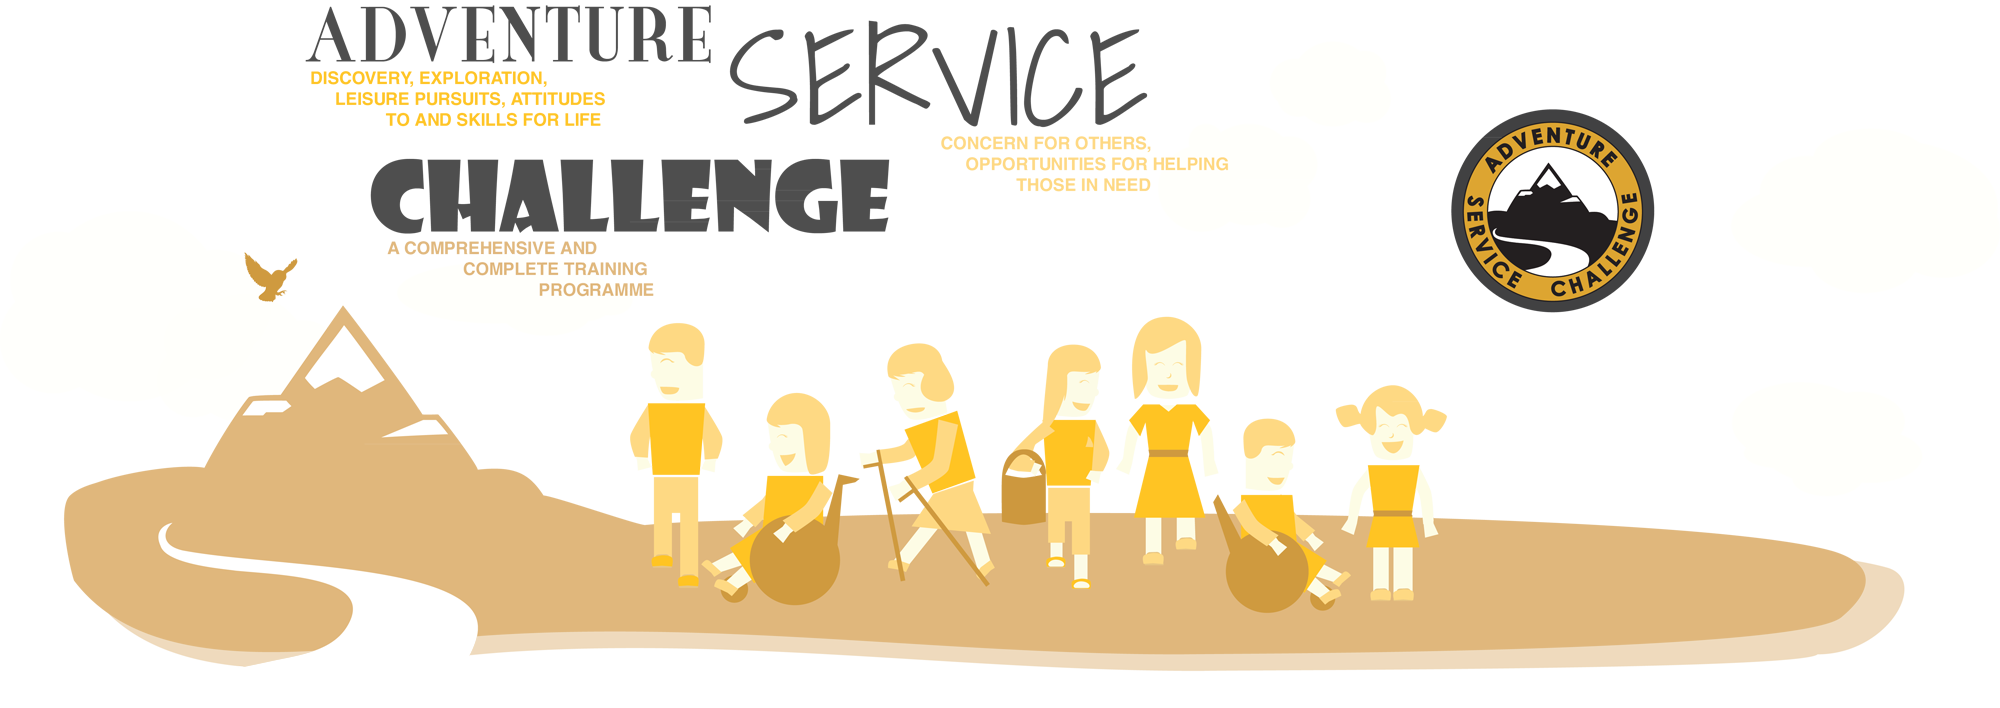 Adventure service challenge